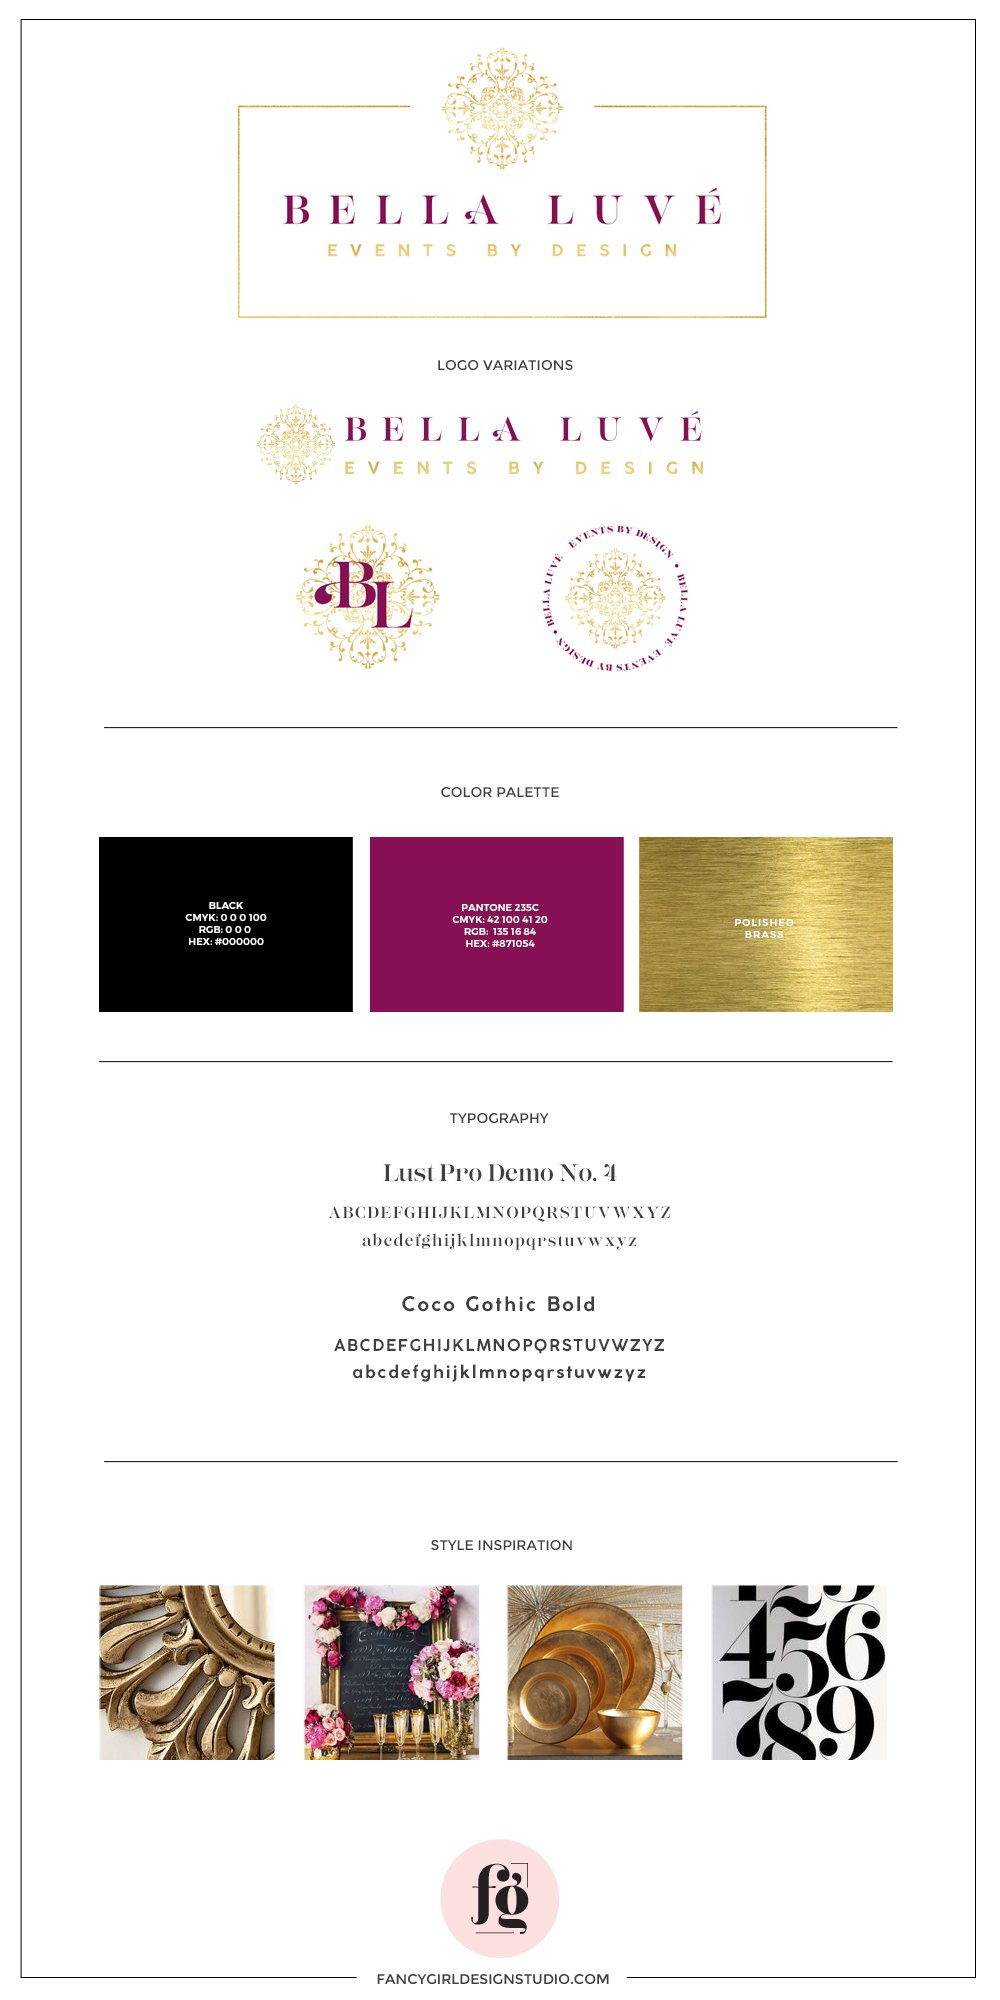 Bella Luve Brand Guide by Fancy Girl Design Studio